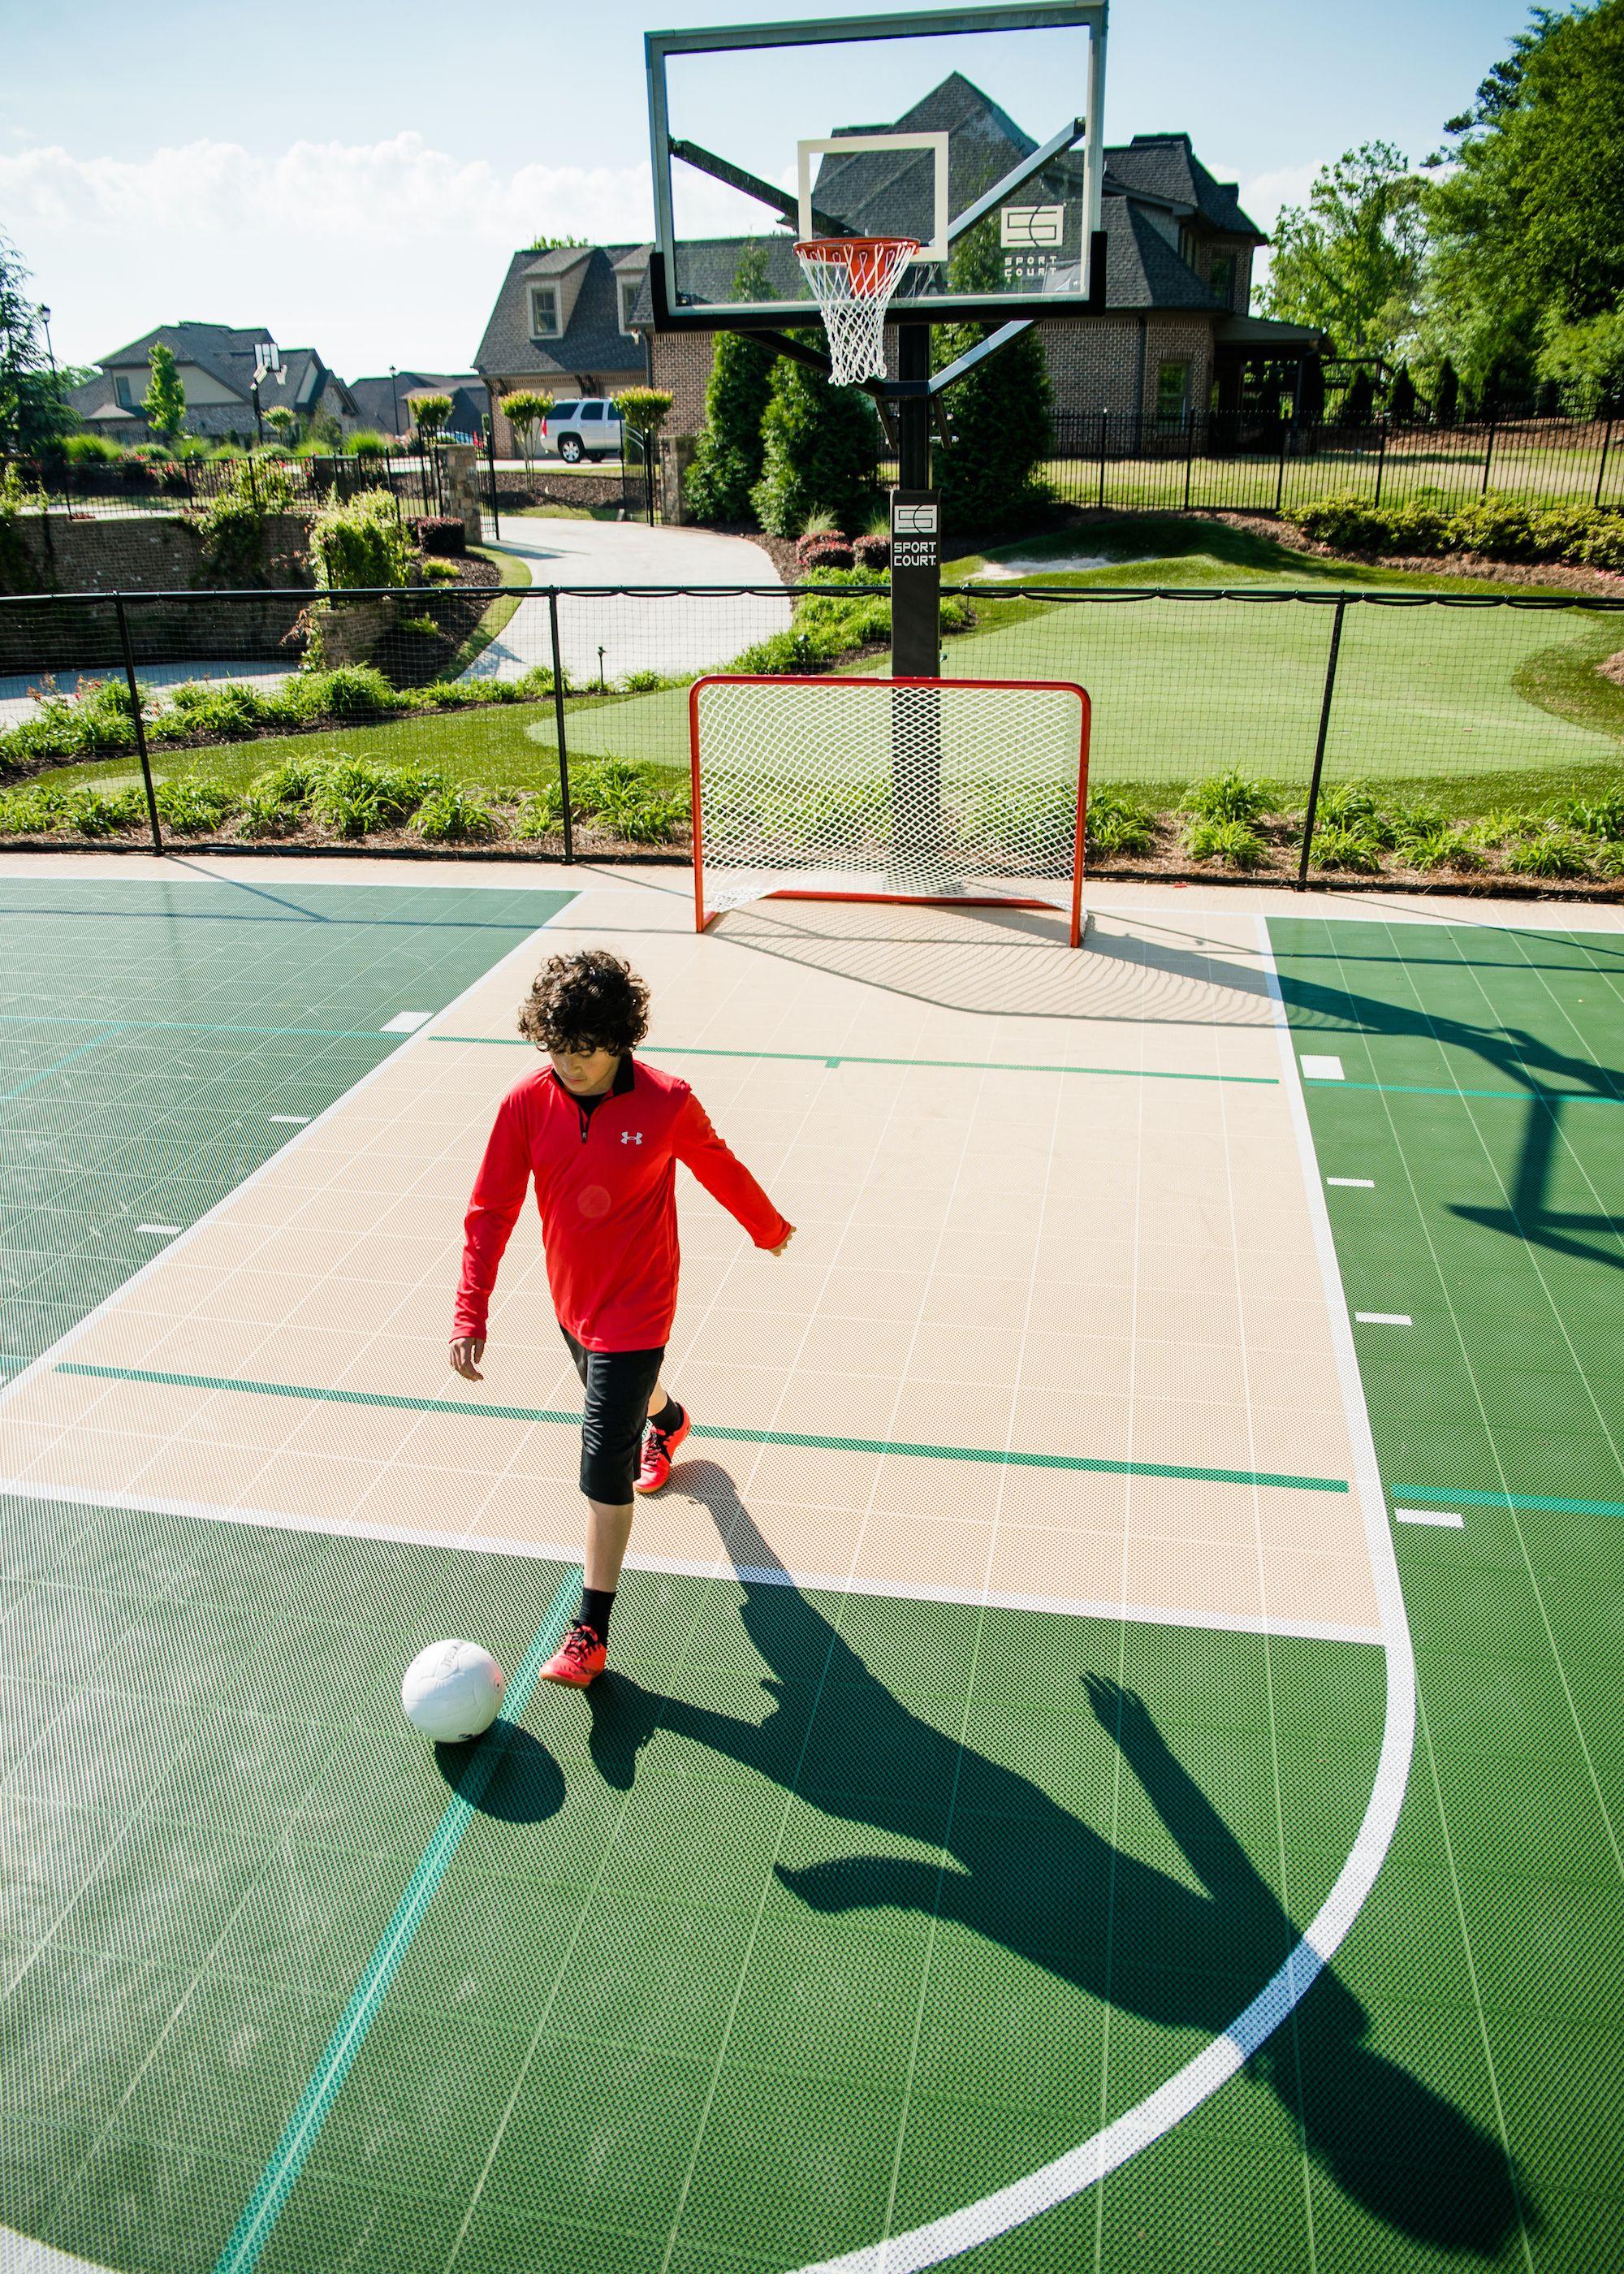 Residential Multi Game Sport Court Sportprosusa Backyard Sports Sport Court Basketball Court Backyard